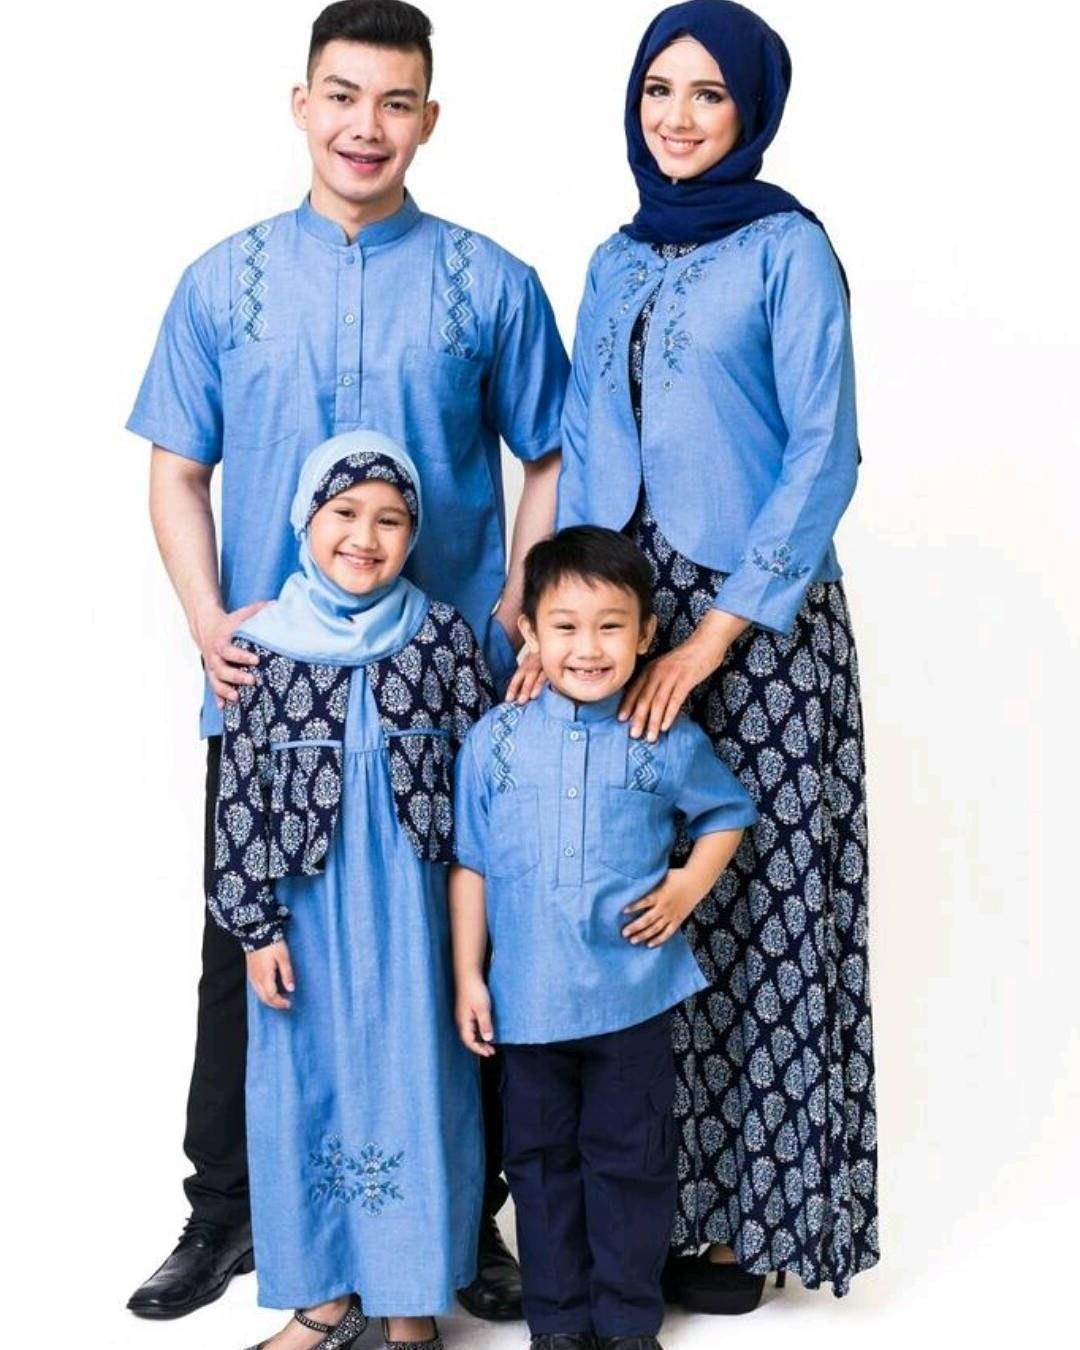 Inspirasi Inspirasi Baju Lebaran Keluarga 2018 Whdr Model Baju Keluarga Untuk Hari Raya Lebaran 2018